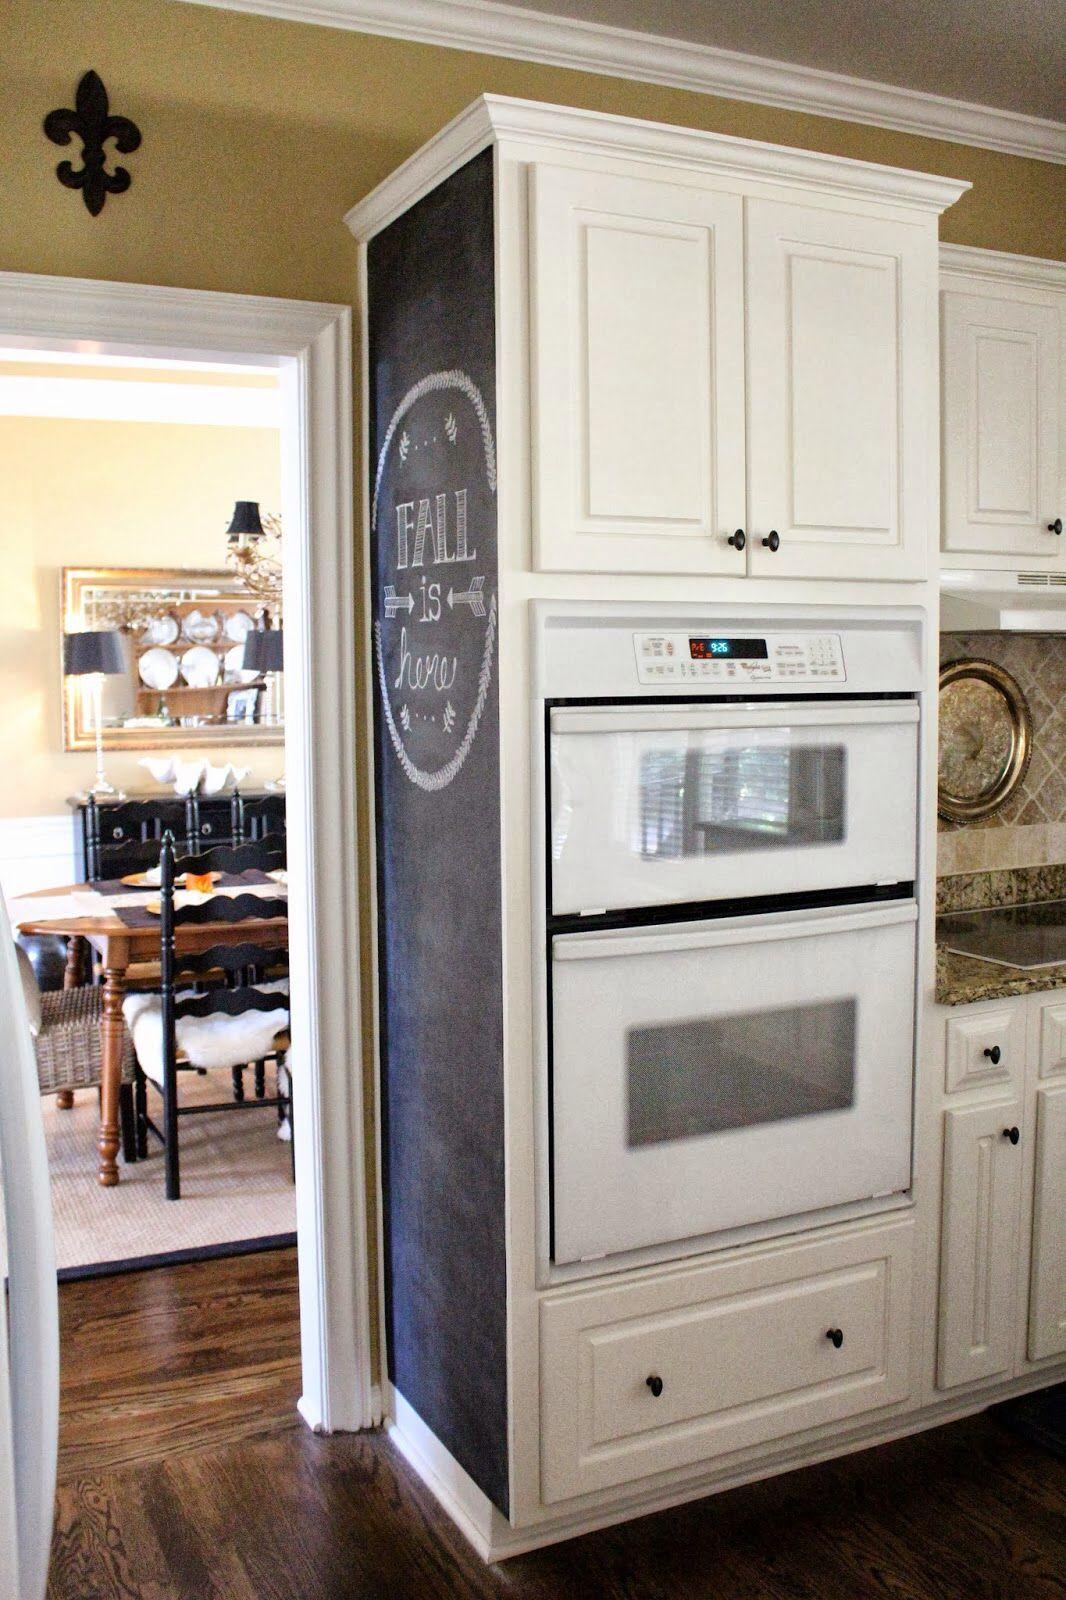 Chalkboard Chalkboard Wall Kitchen Kitchen Wall Cabinets Kitchen Chalkboard